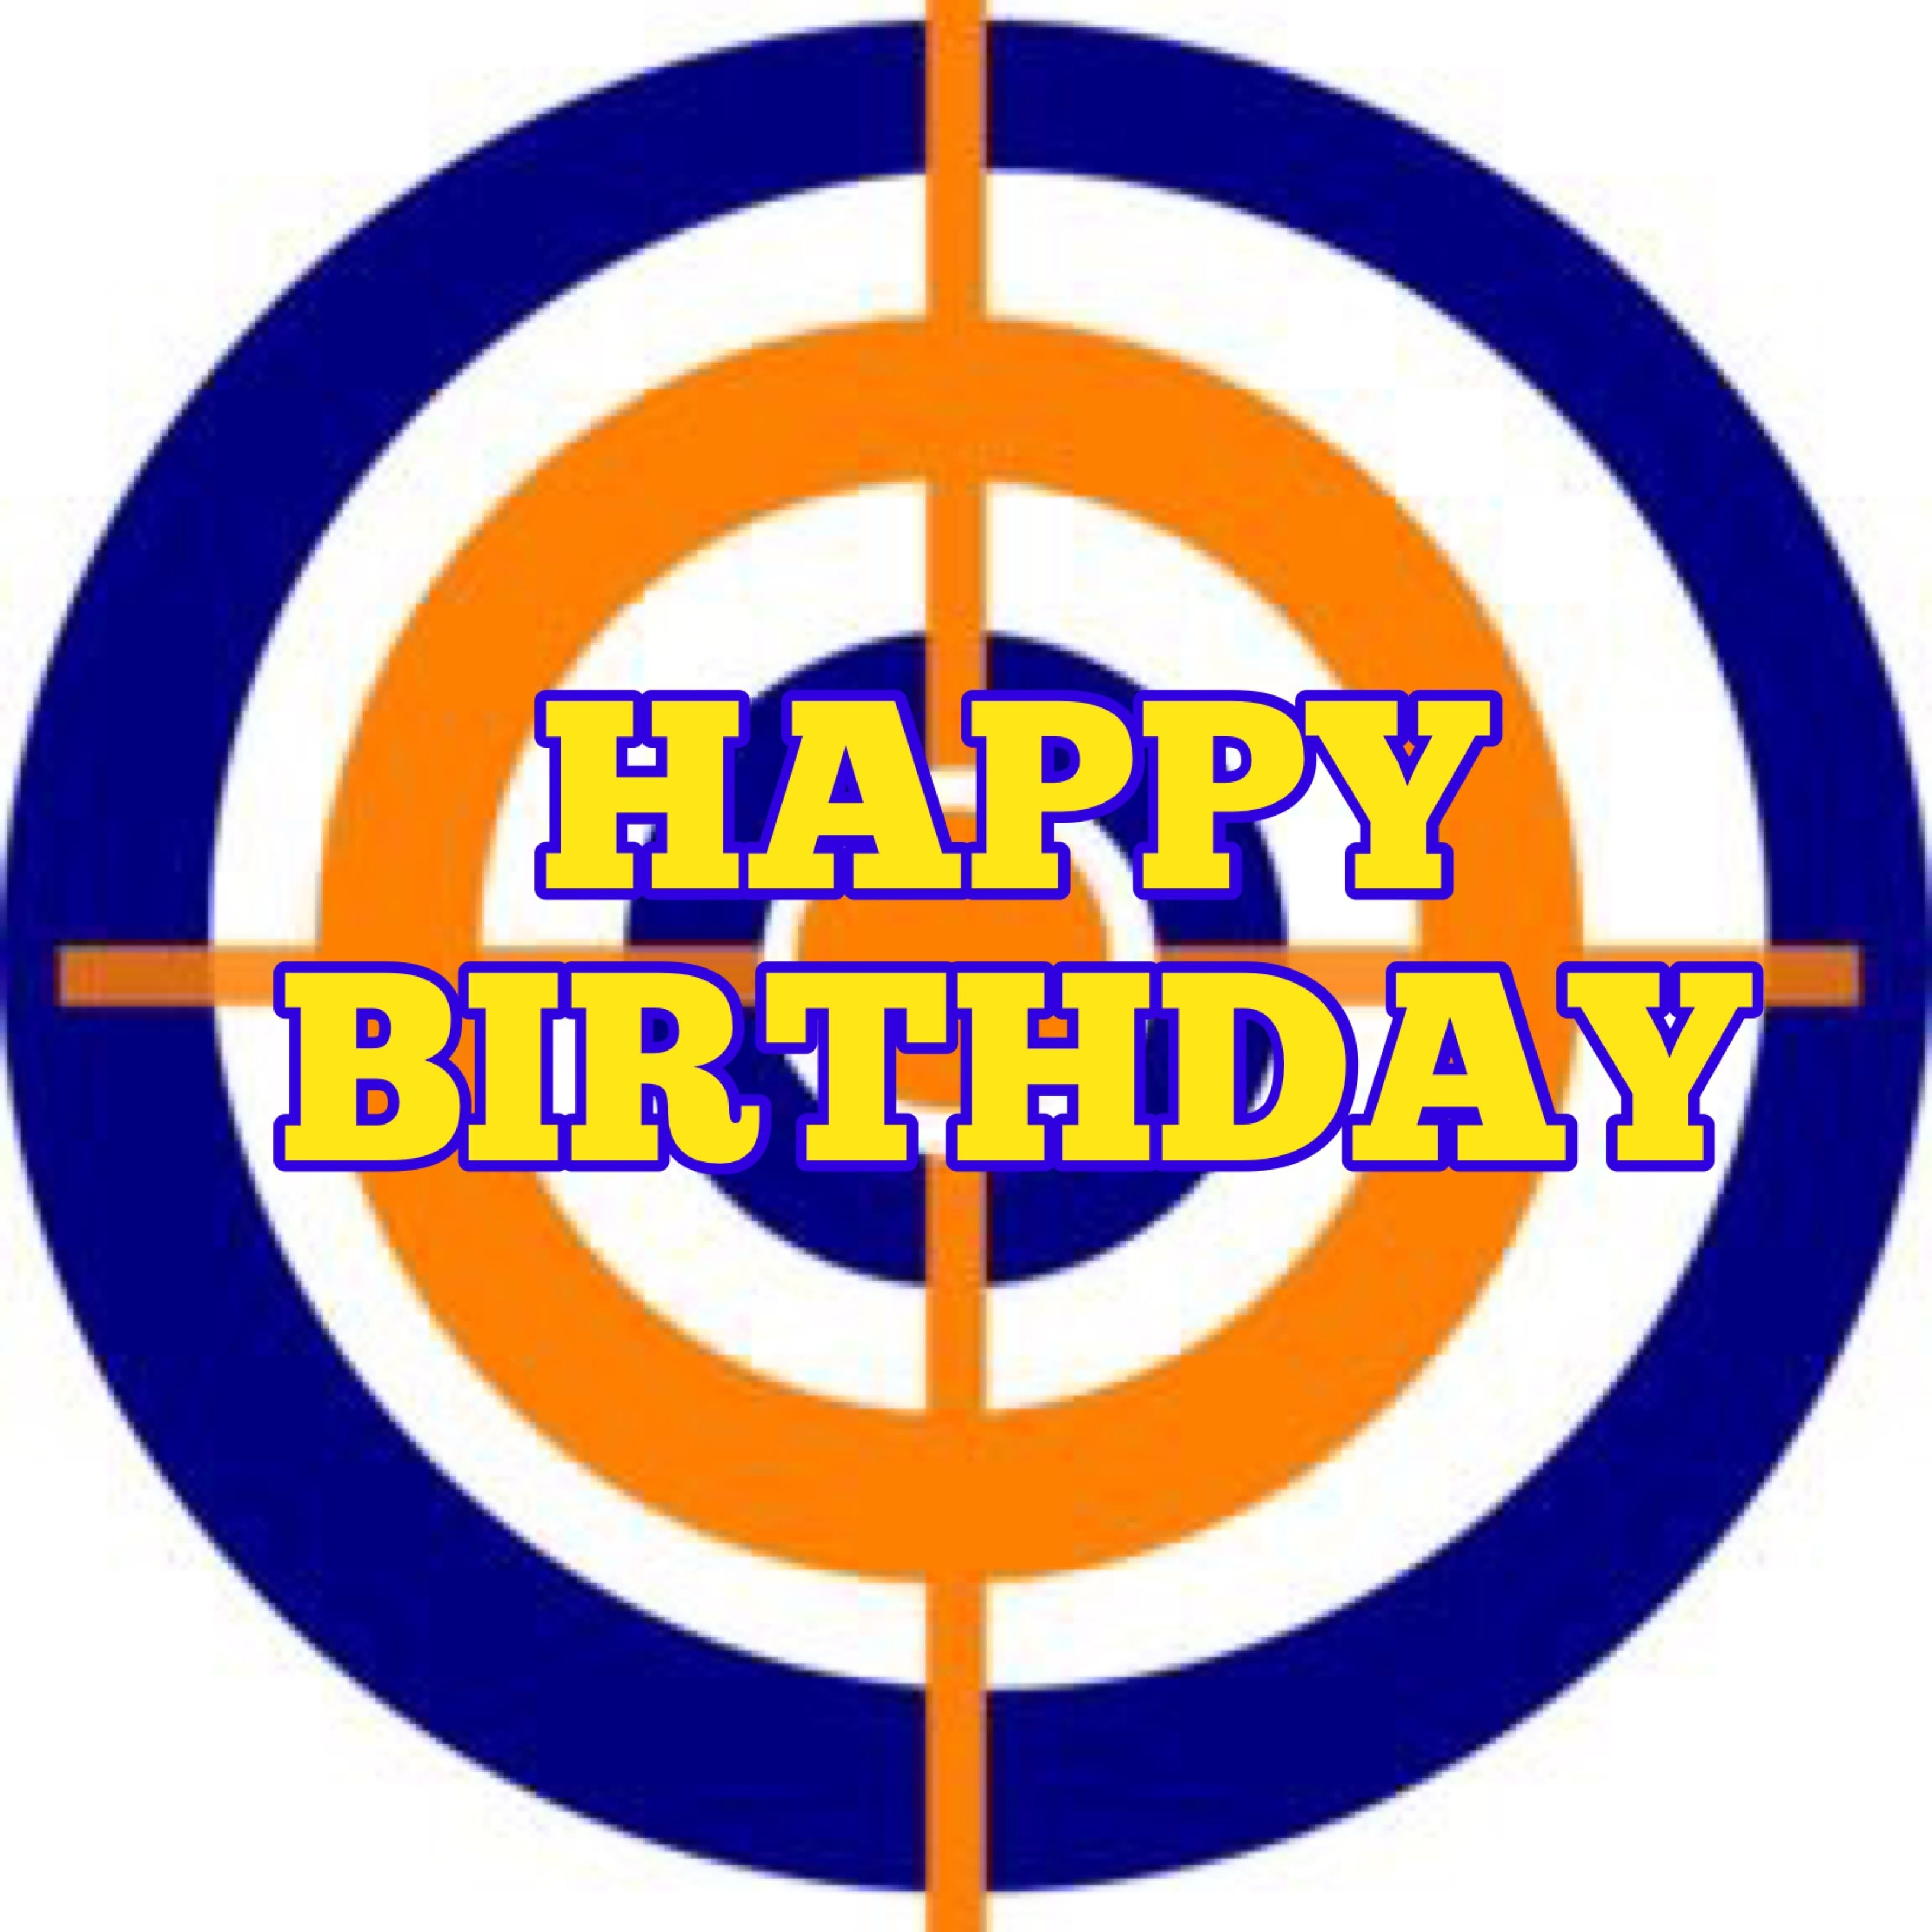 File:nerf Logo.svg - Wikimedia Commons | Cakes | Nerf Birthday Party - Free Printable Nerf Logo